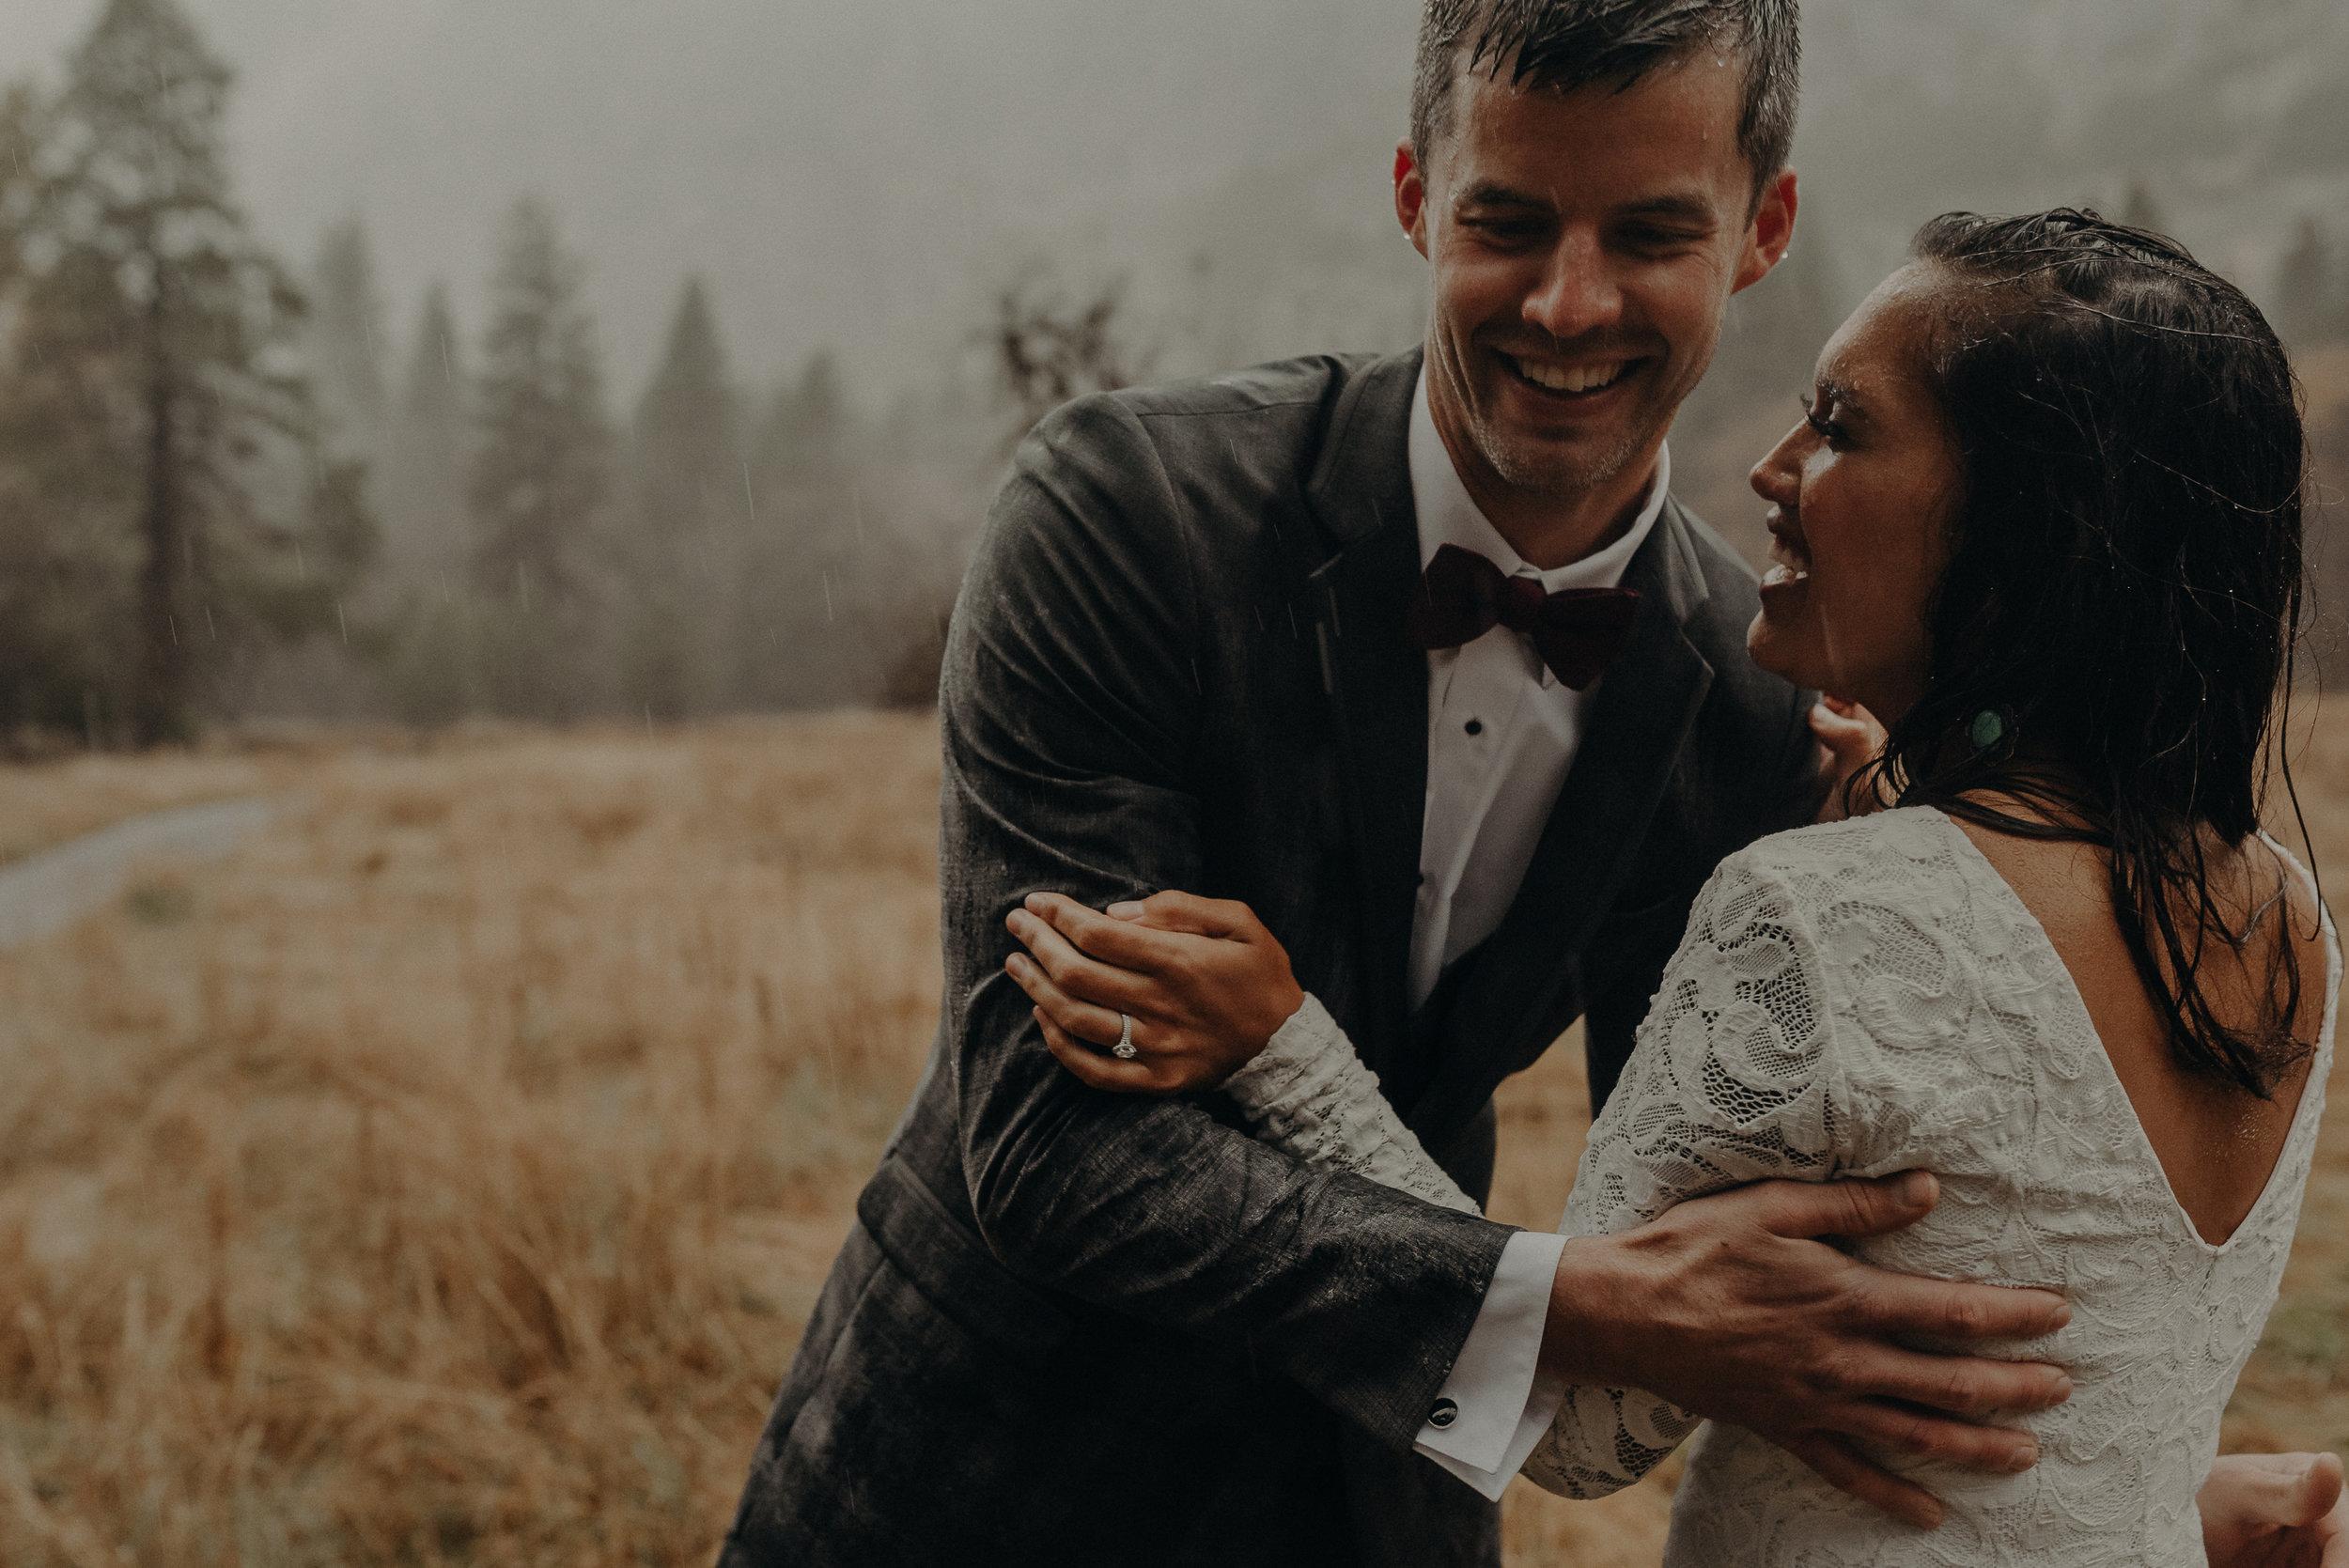 Isaiah + Taylor Photography - Yosemite Elopement - Los Angeles Wedding Photographer-65.jpg